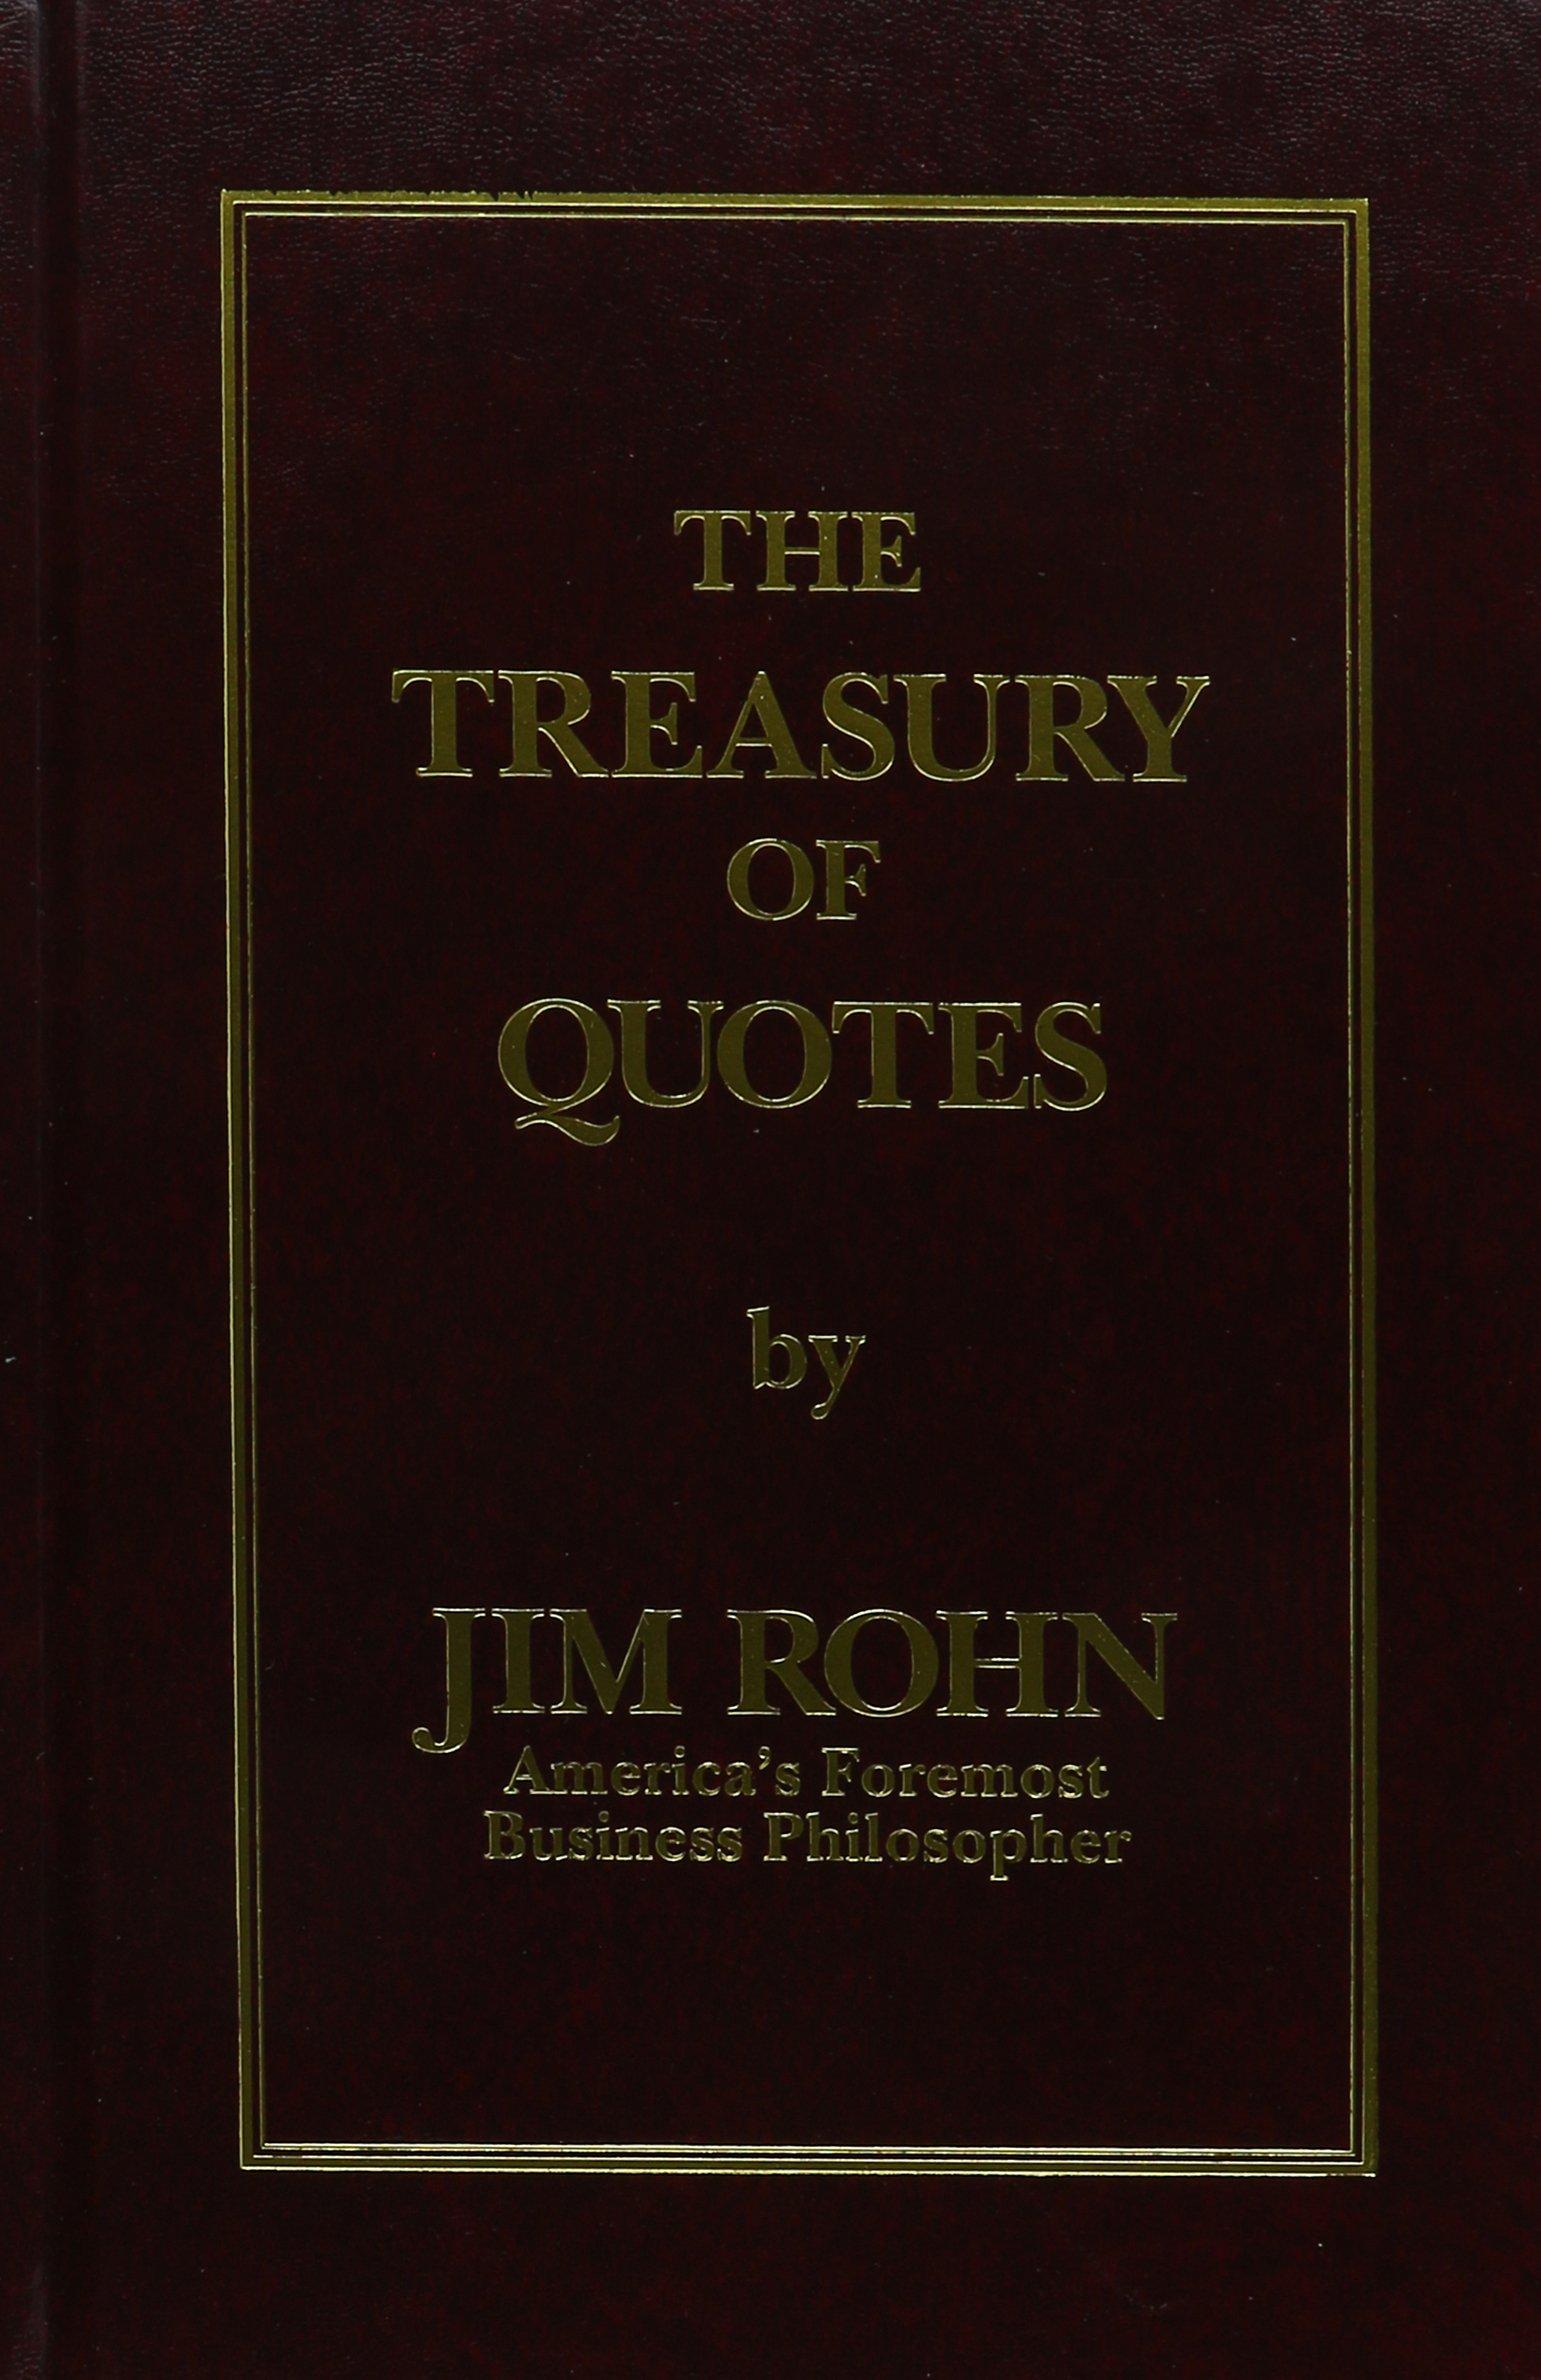 The Treasury Of Quotes Jim Rohn 0646511008588 Amazon Books